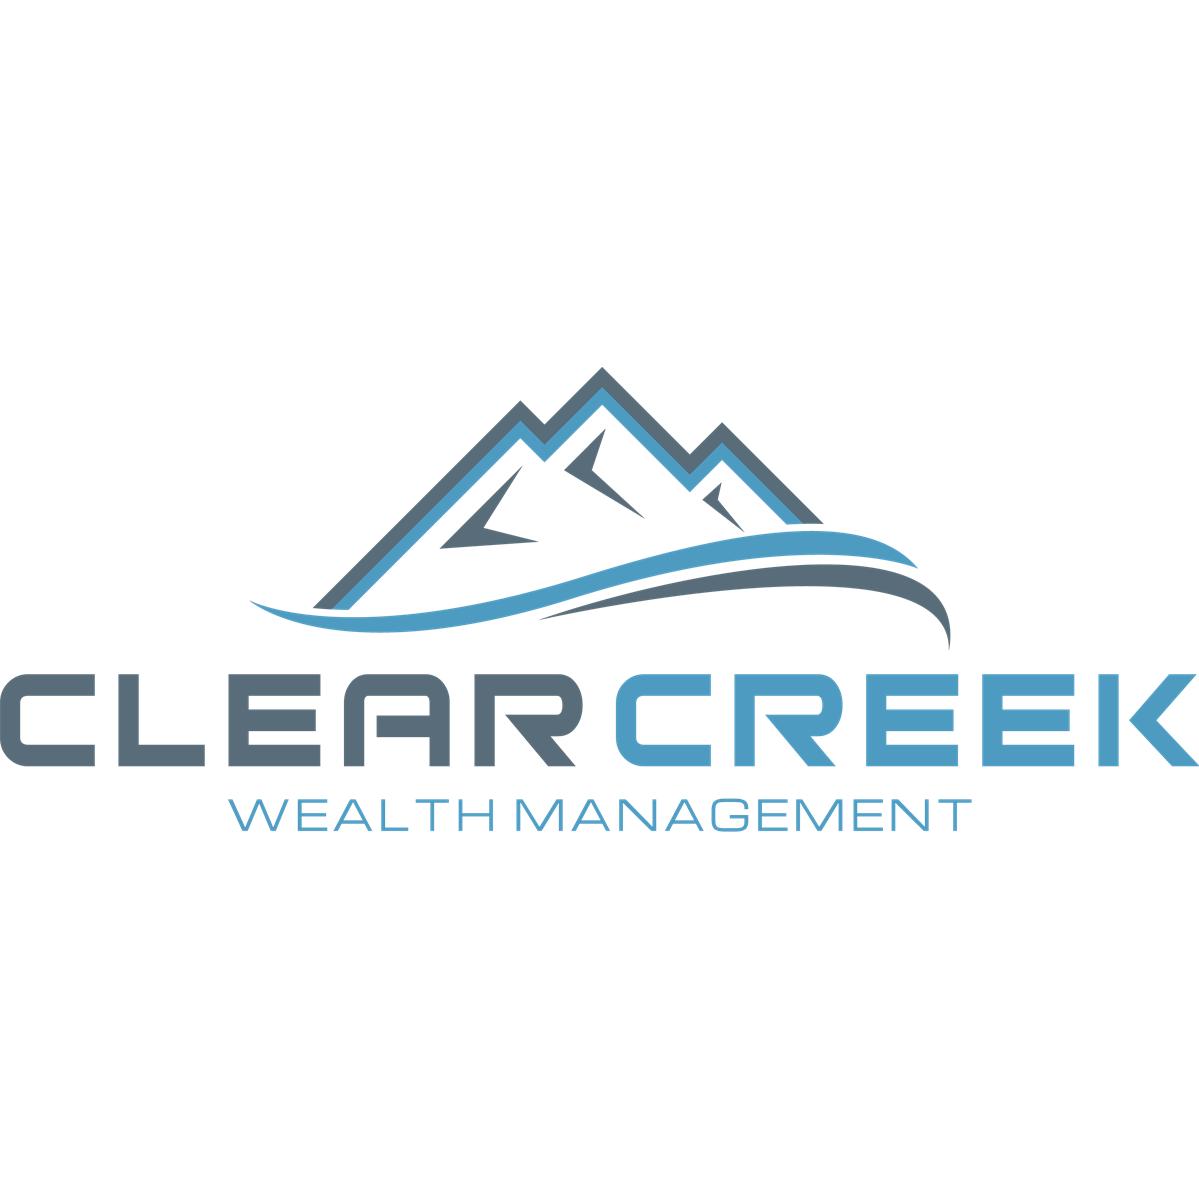 Clear Creek Wealth Management image 2